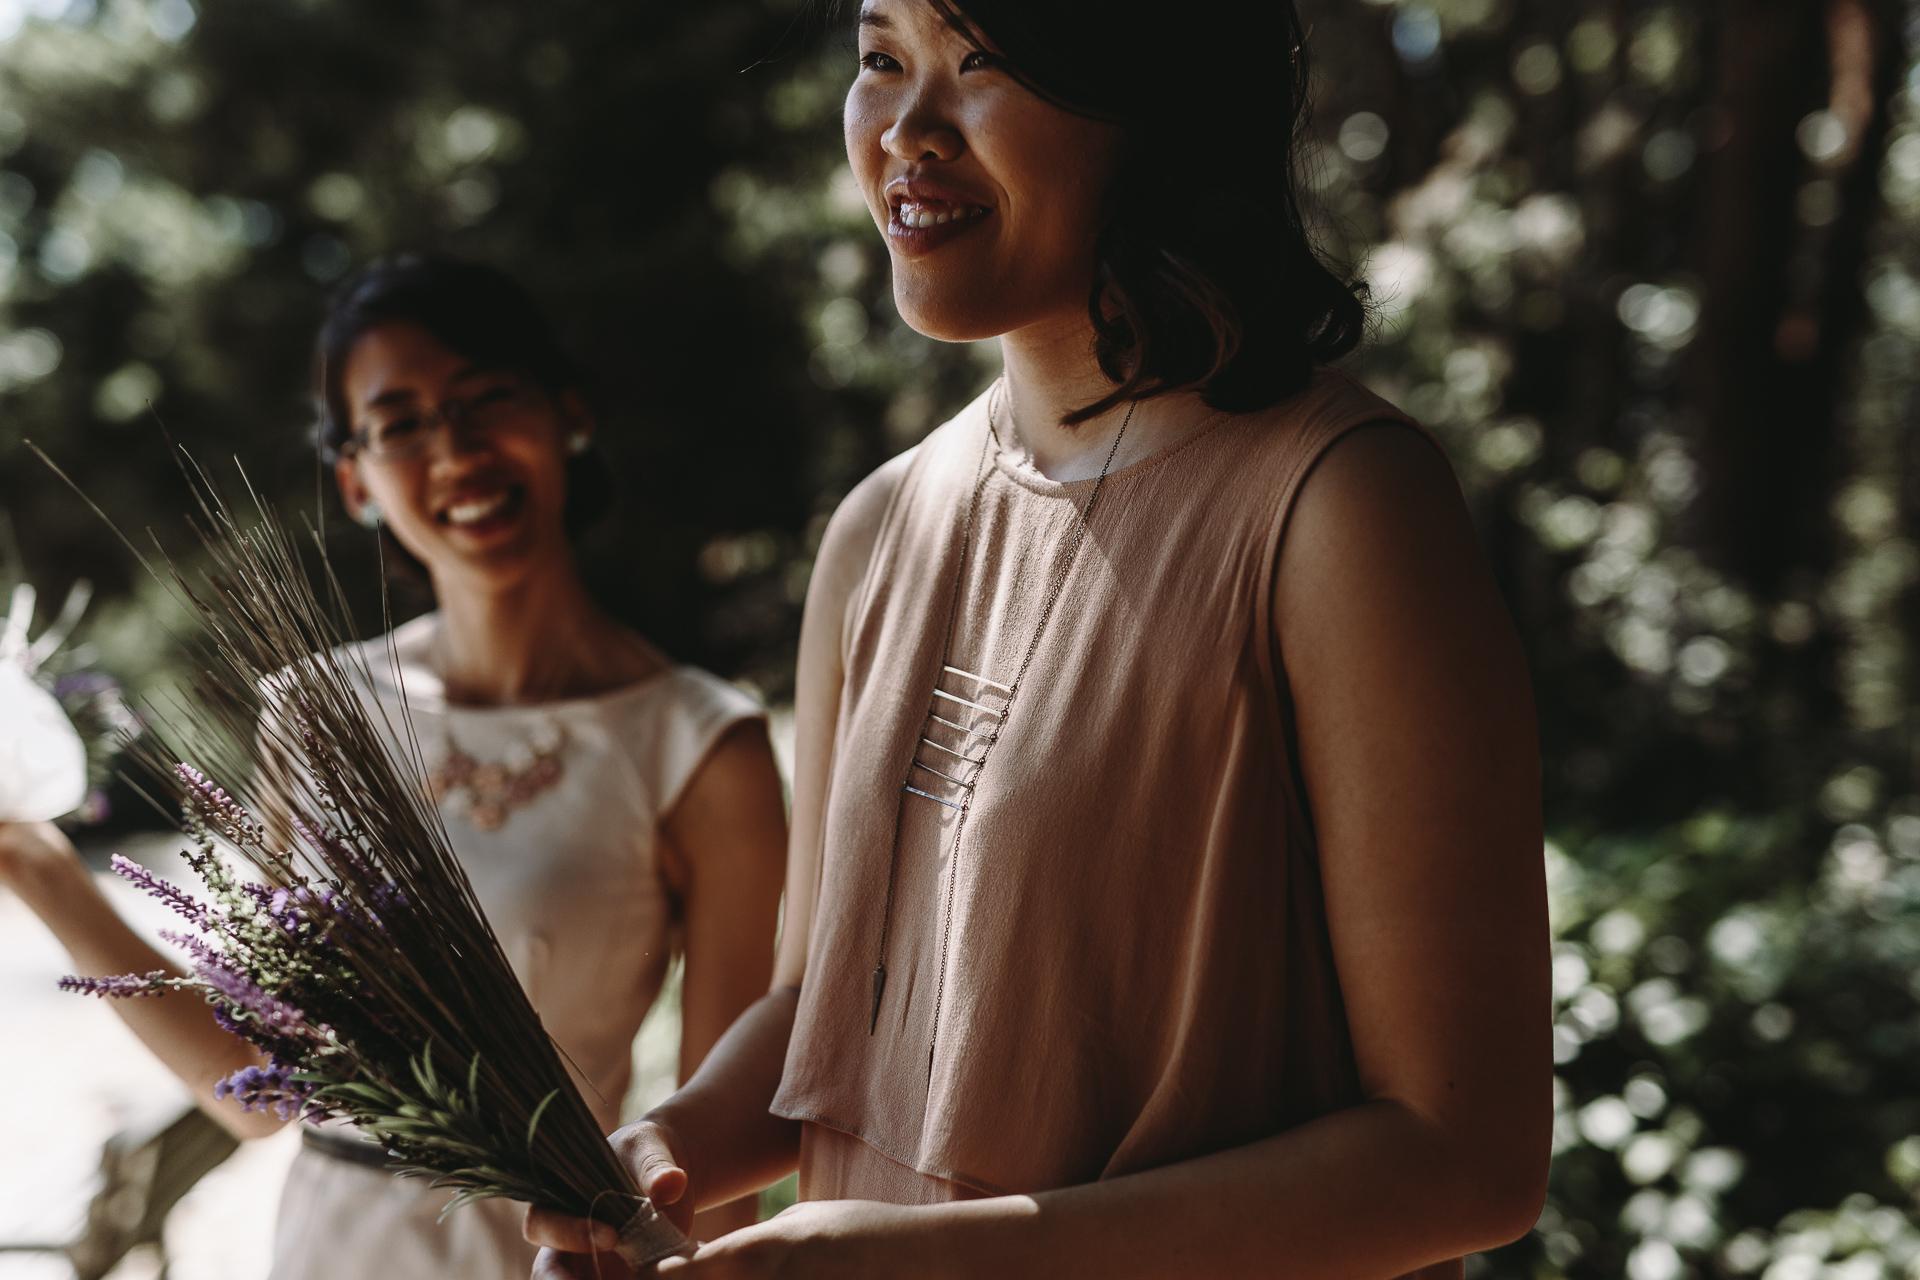 jess-hunter-seattle-artistic-wedding-photographer-4375.jpg